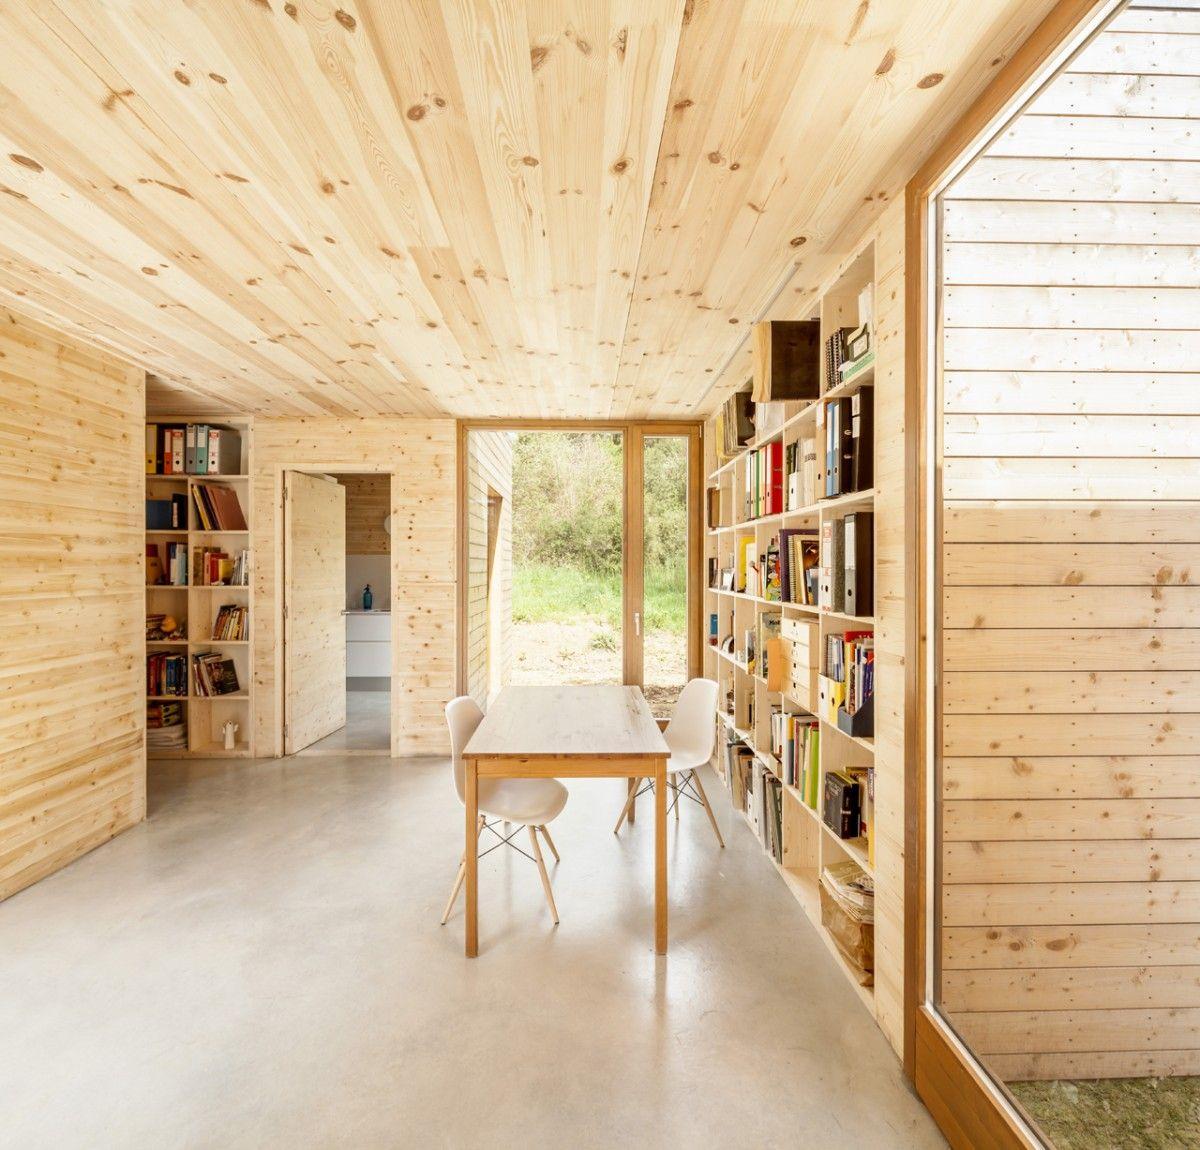 Una Casa De Madera En El Bosque Decorabien Com Arquitectura  # Muebles Bosques Sostenibles